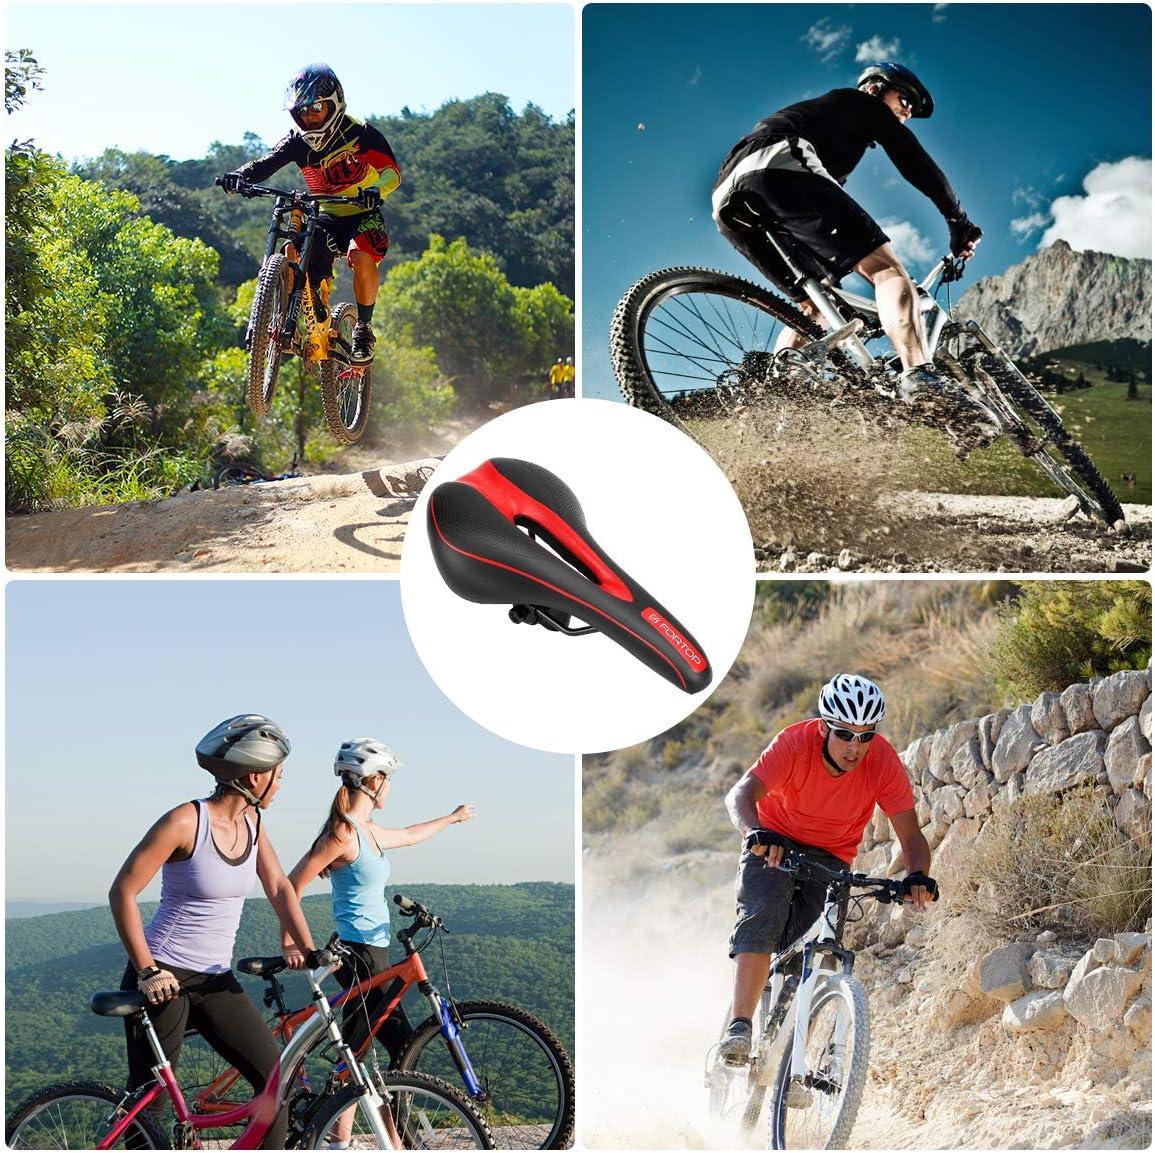 FORTOP Most Comfortable Bike Seat Bicycle Saddle Cushion for Men Women